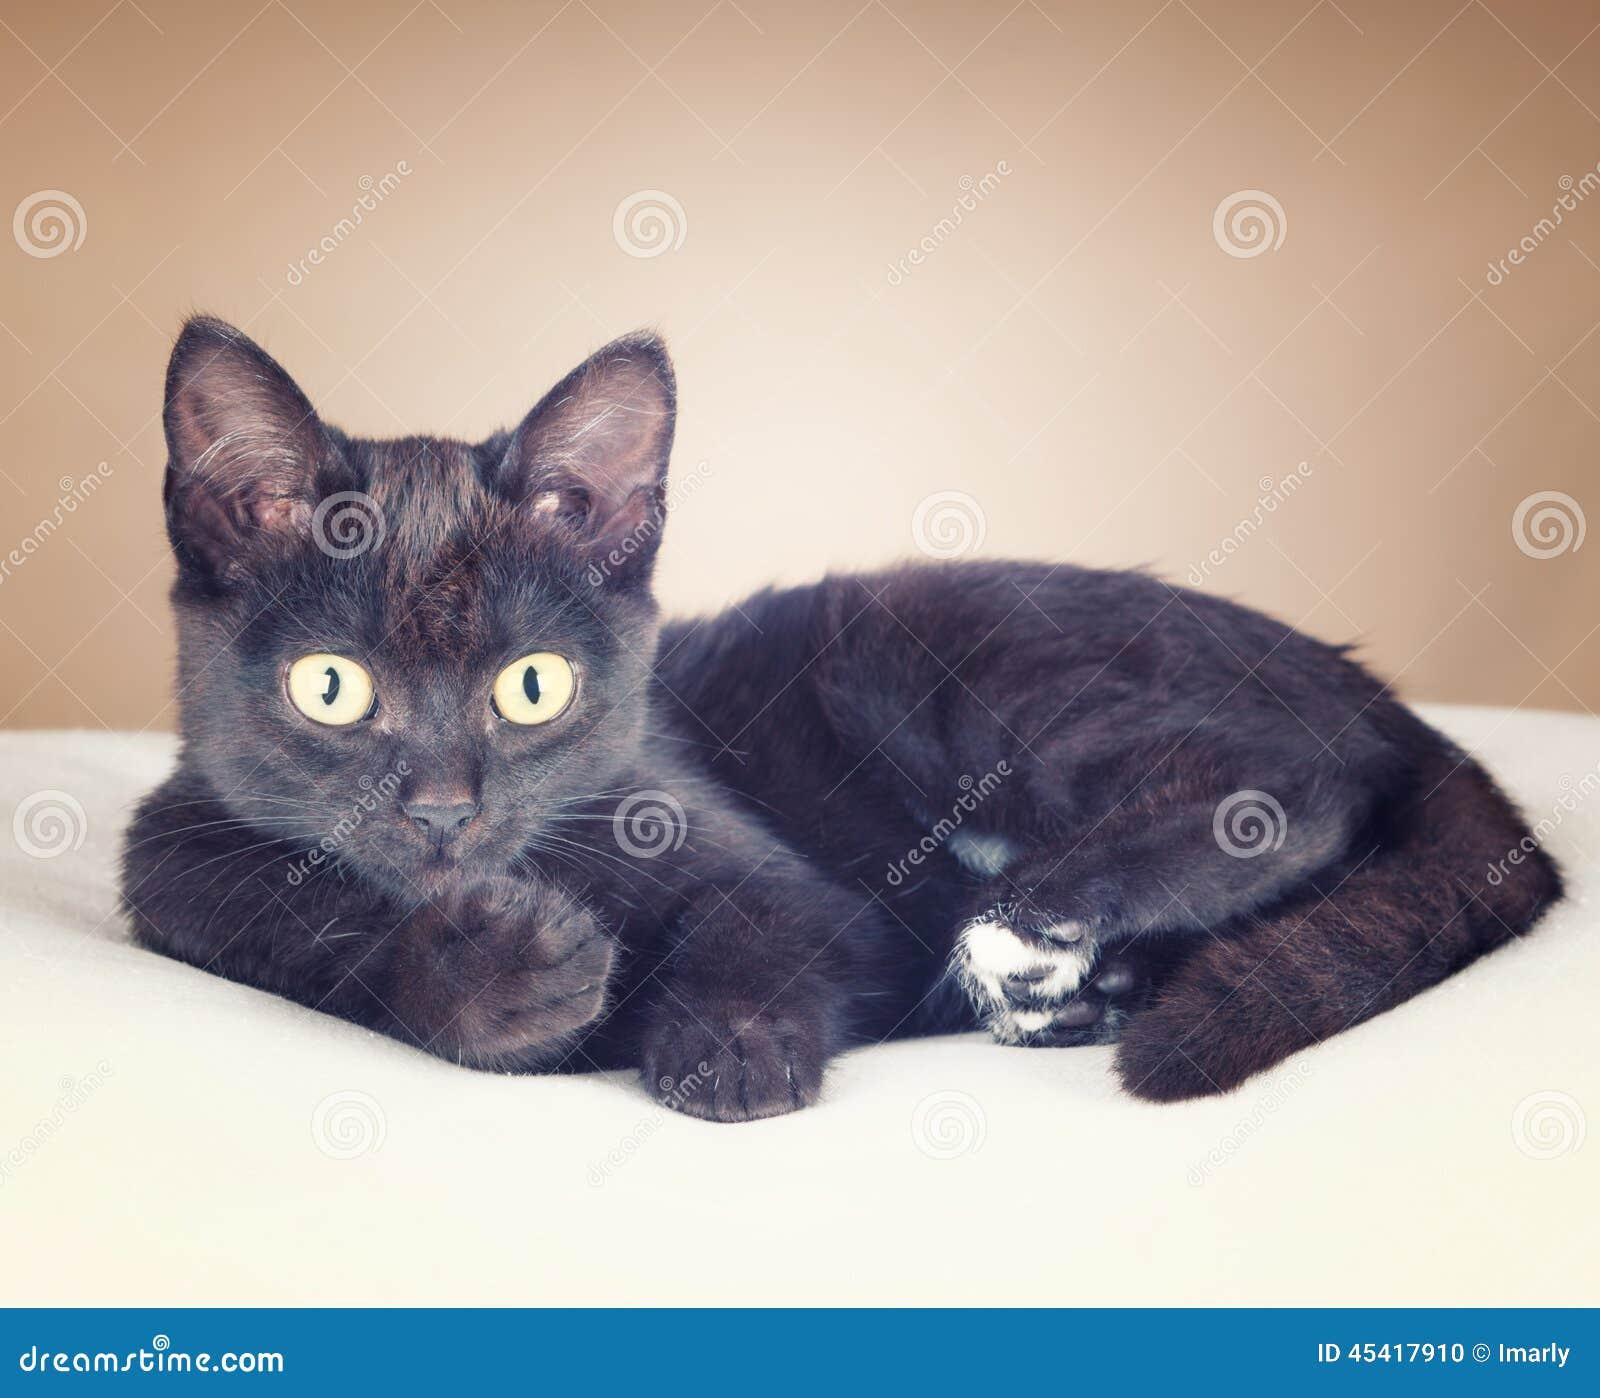 6a99c02ebd3e Μια μαύρη γάτα που στηρίζεται σε ένα μαξιλάρι σε ένα καφετί υπόβαθρο και  που εξετάζει σας